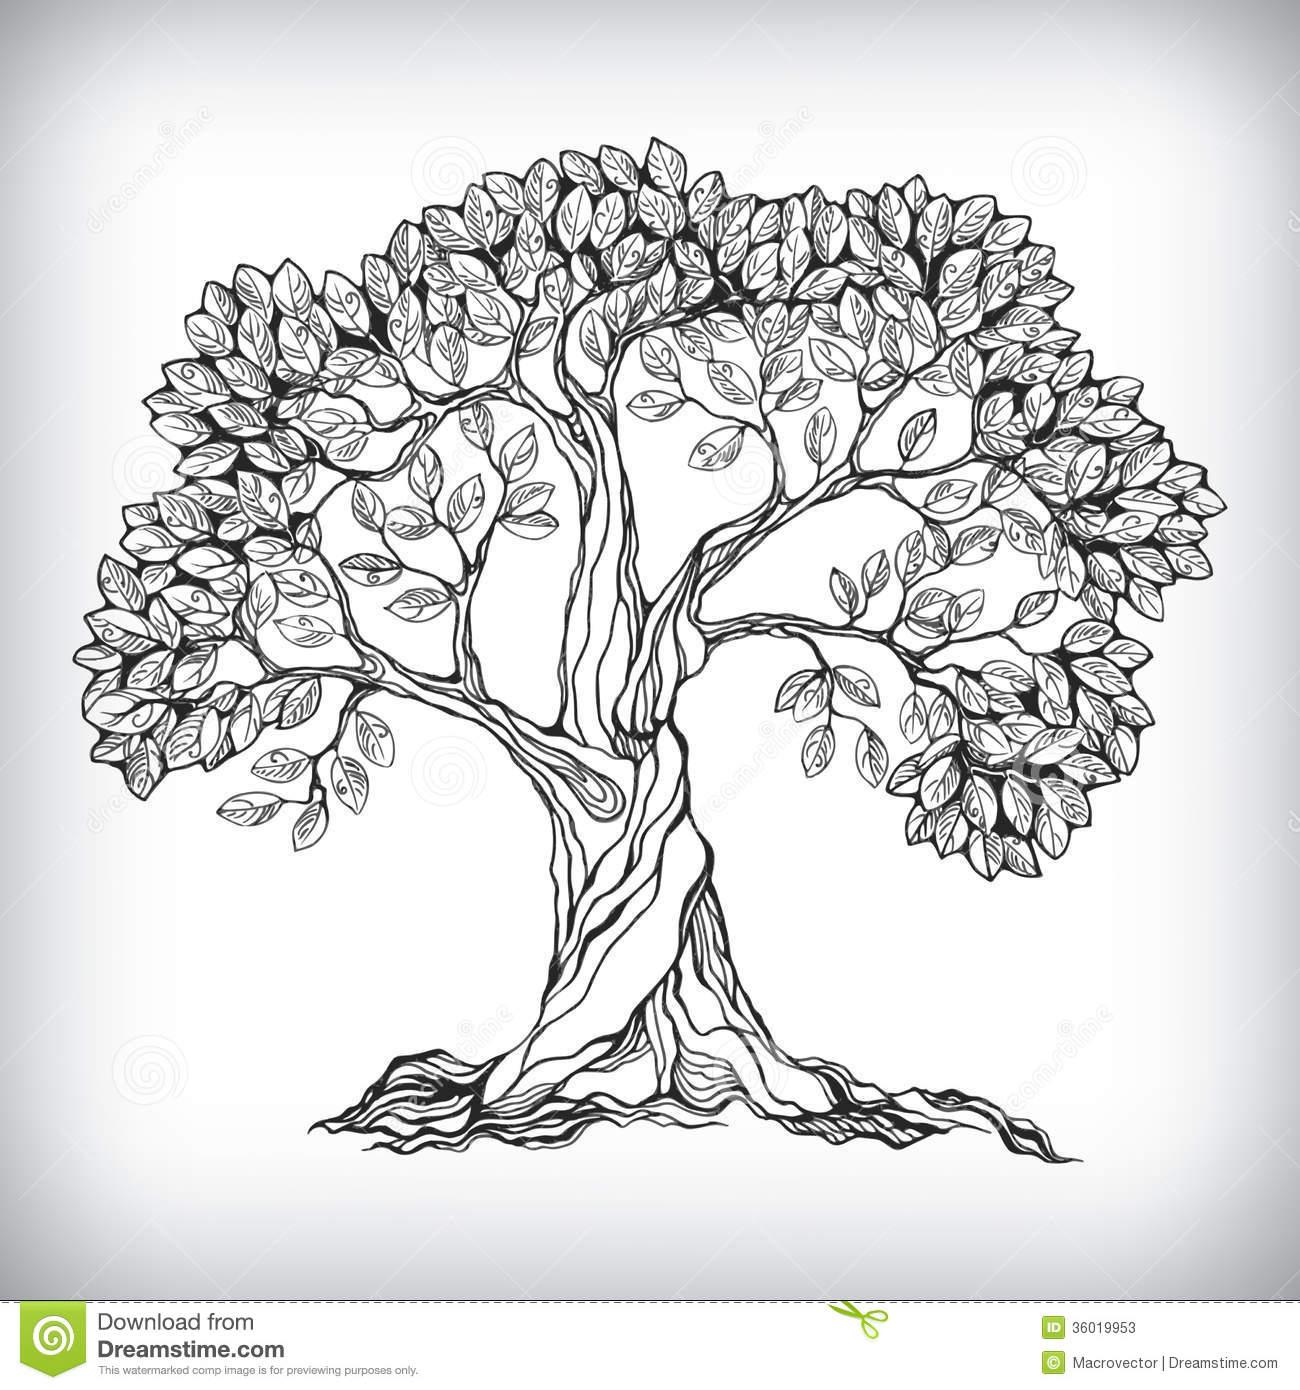 Drawn symbol drawing Stock Hand Tree Tree From